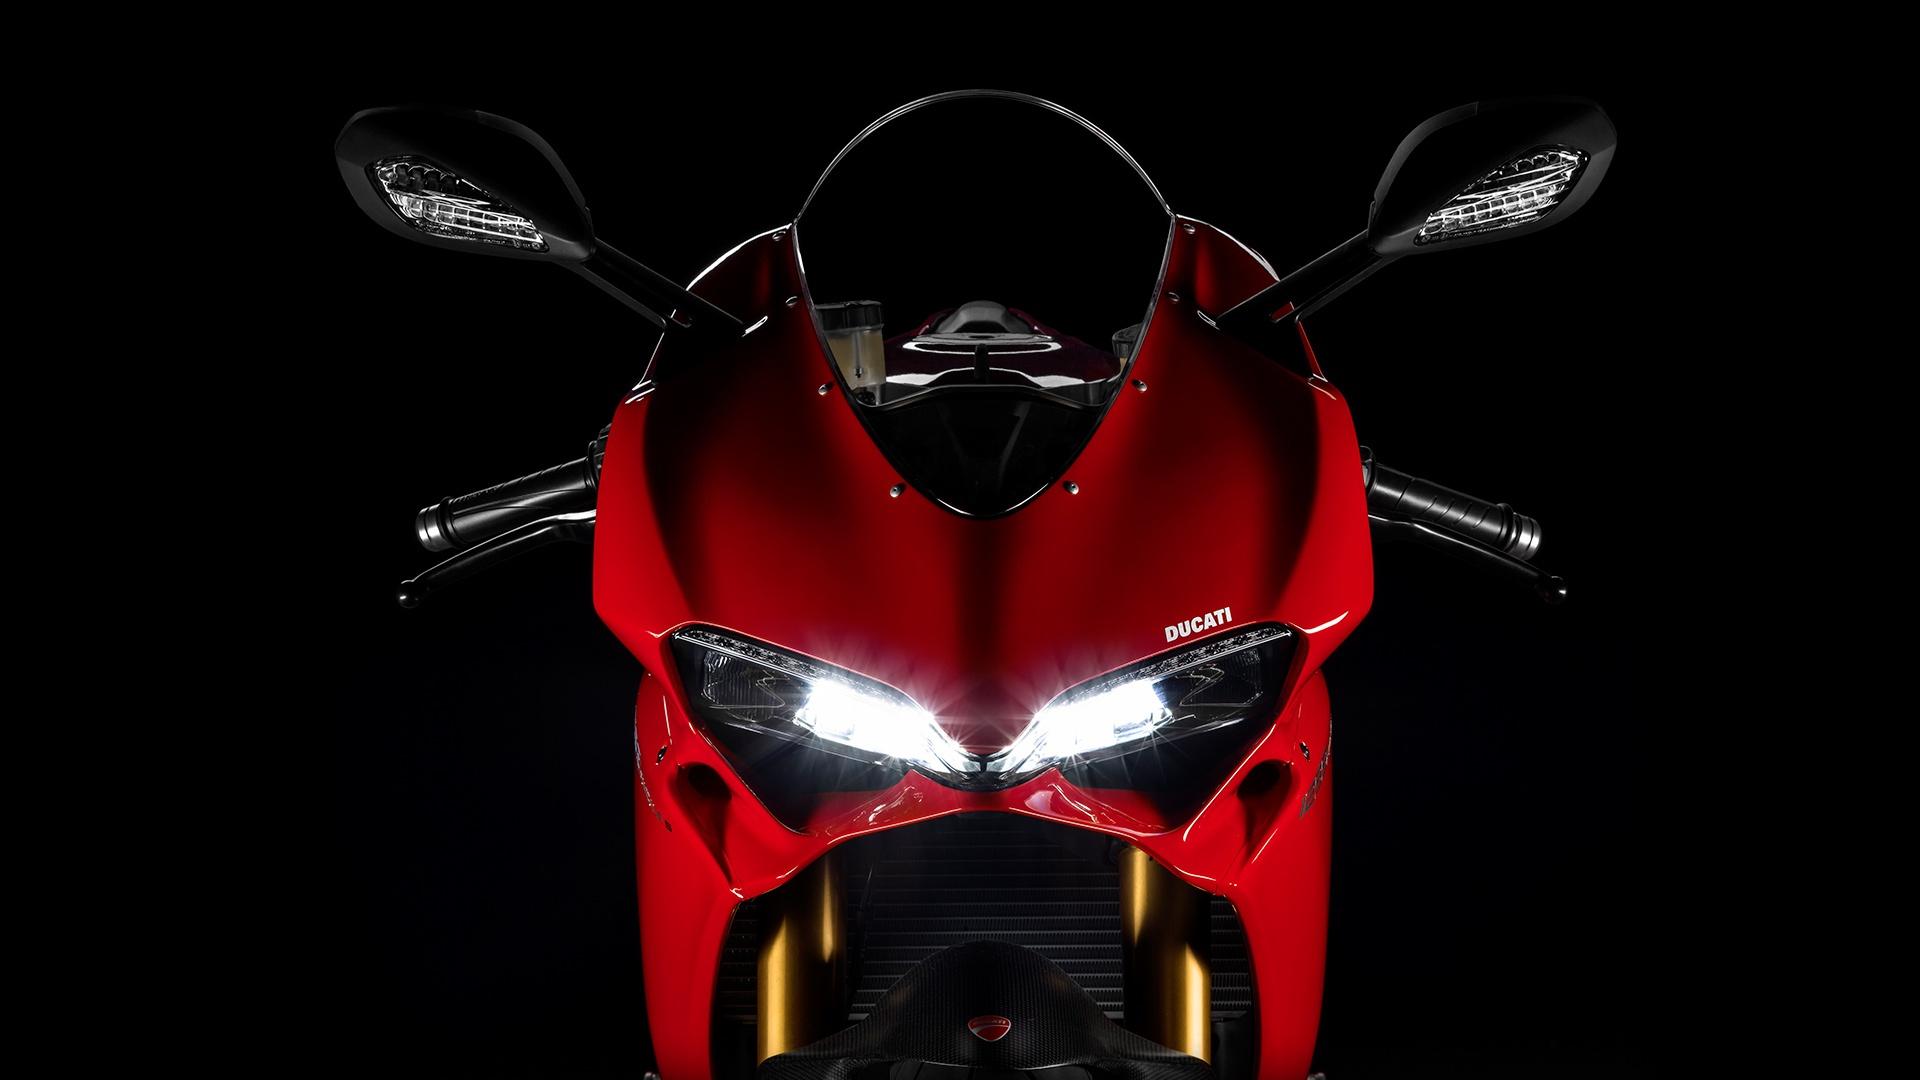 МОТОЦИКЛ DUCATI SUPERBIKE 1299 PANIGALE S ― Артмото - купить квадроцикл в украине и харькове, мотоцикл, снегоход, скутер, мопед, электромобиль